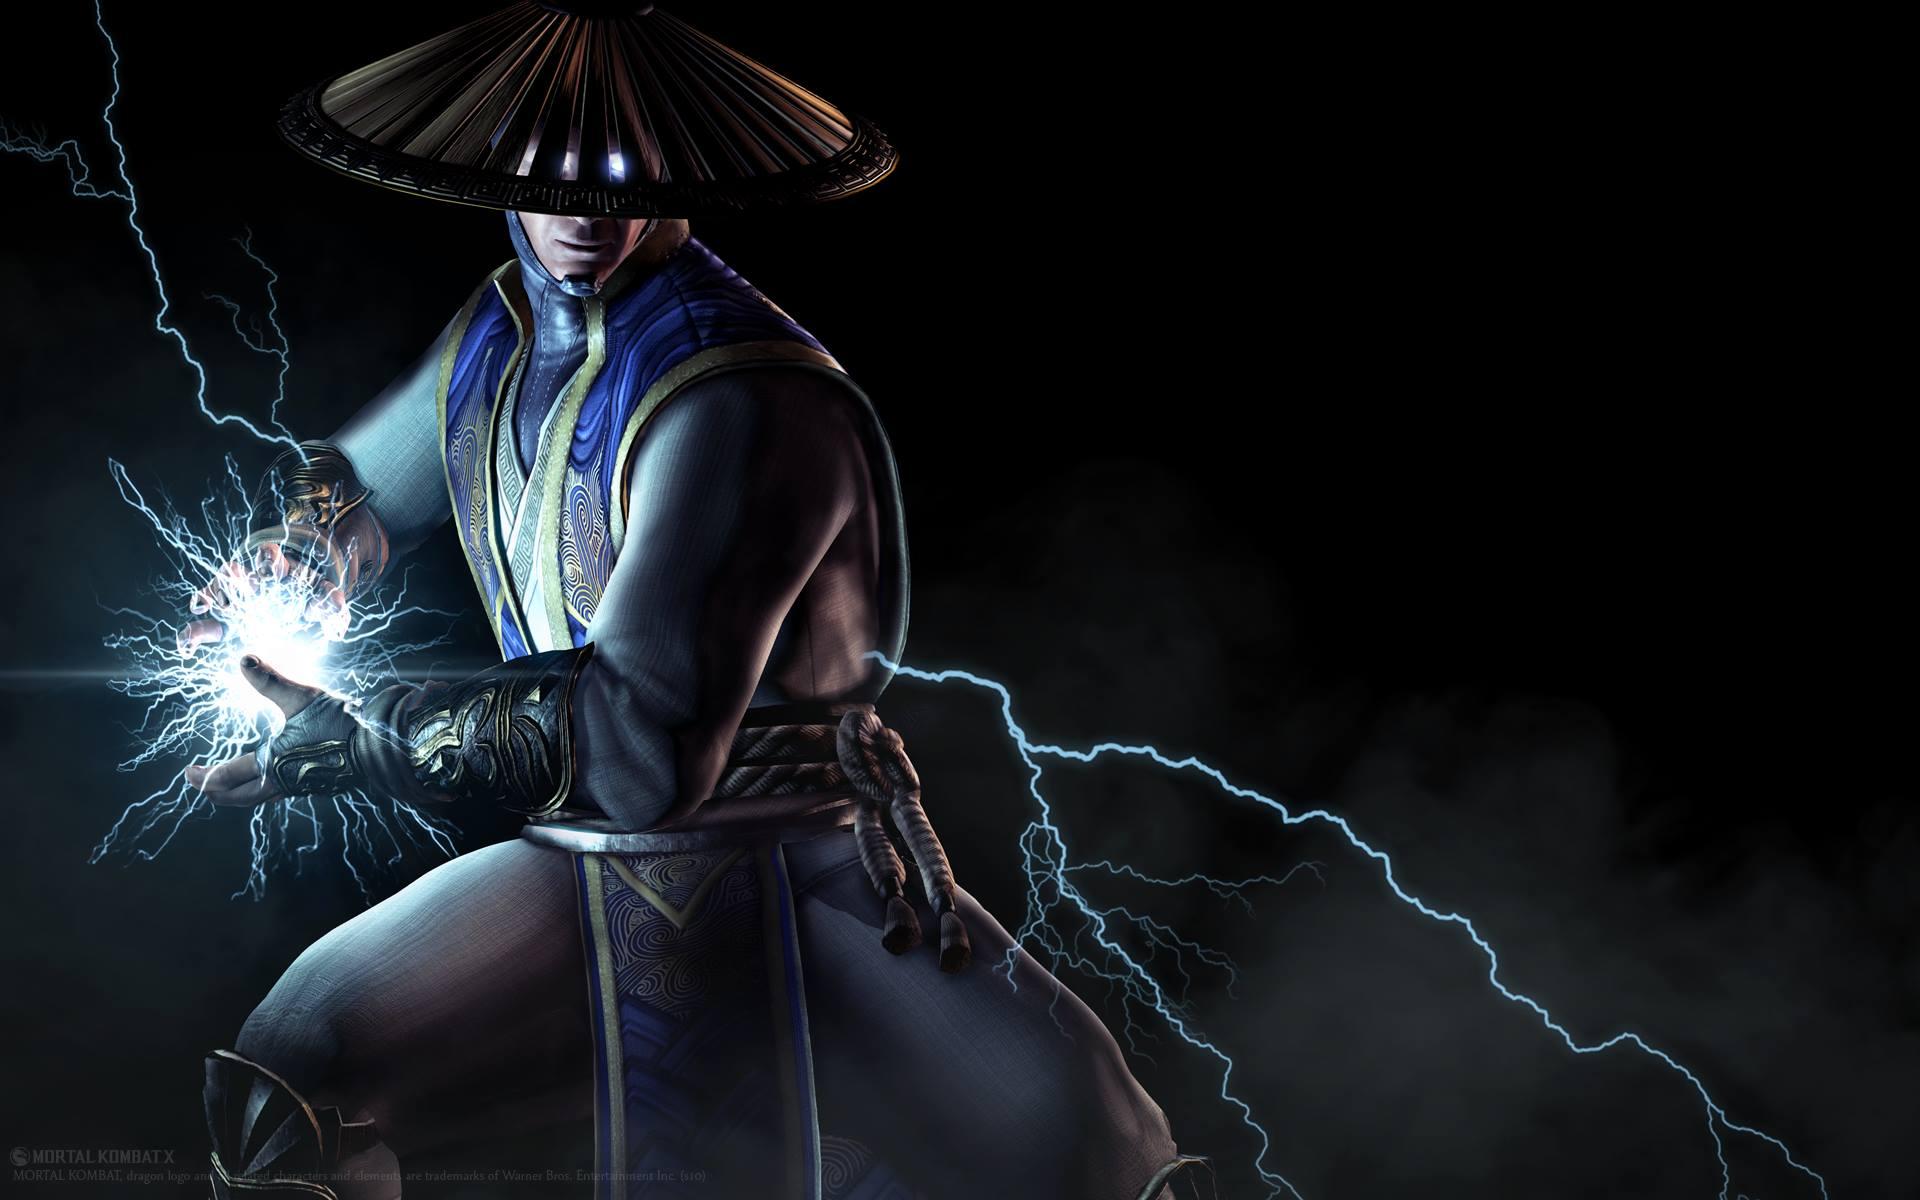 Mortal Kombat X Raiden Render Art Wallpaper Full HD 1920 1920x1200